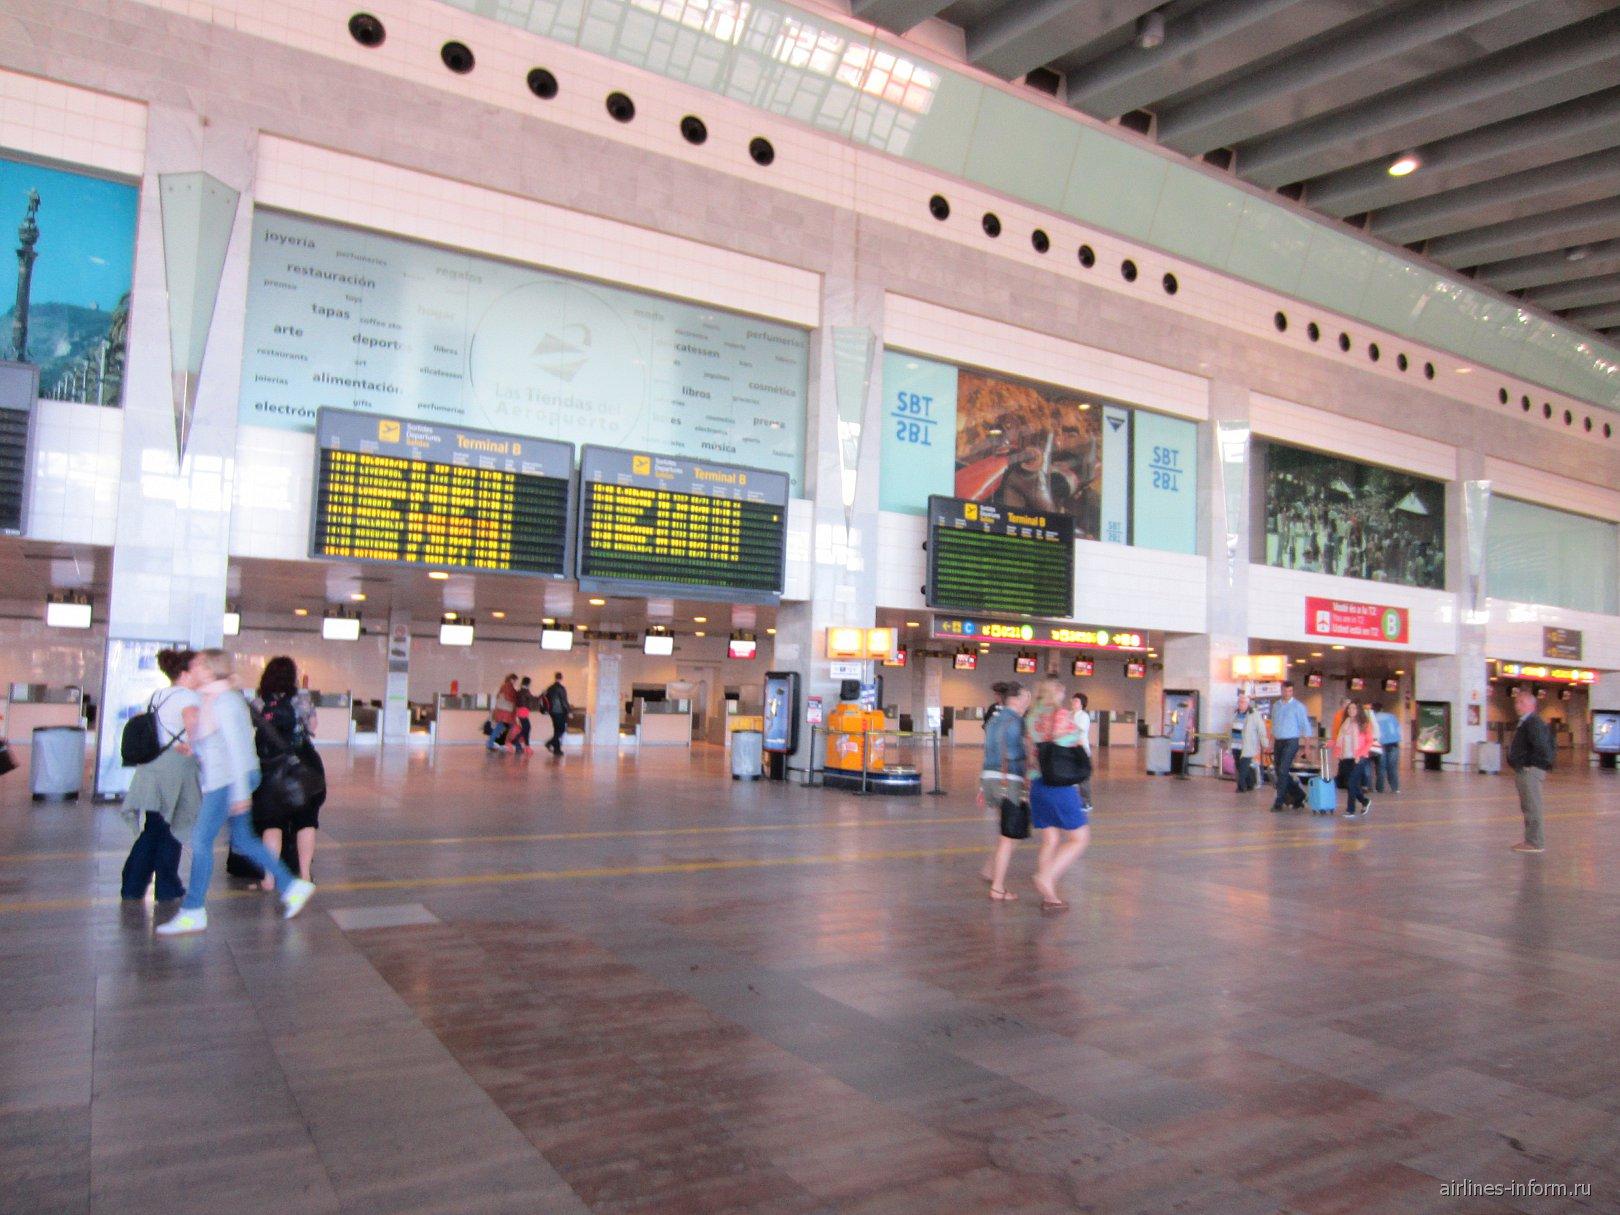 Интерьер Терминала 2 аэропорта Барселоны